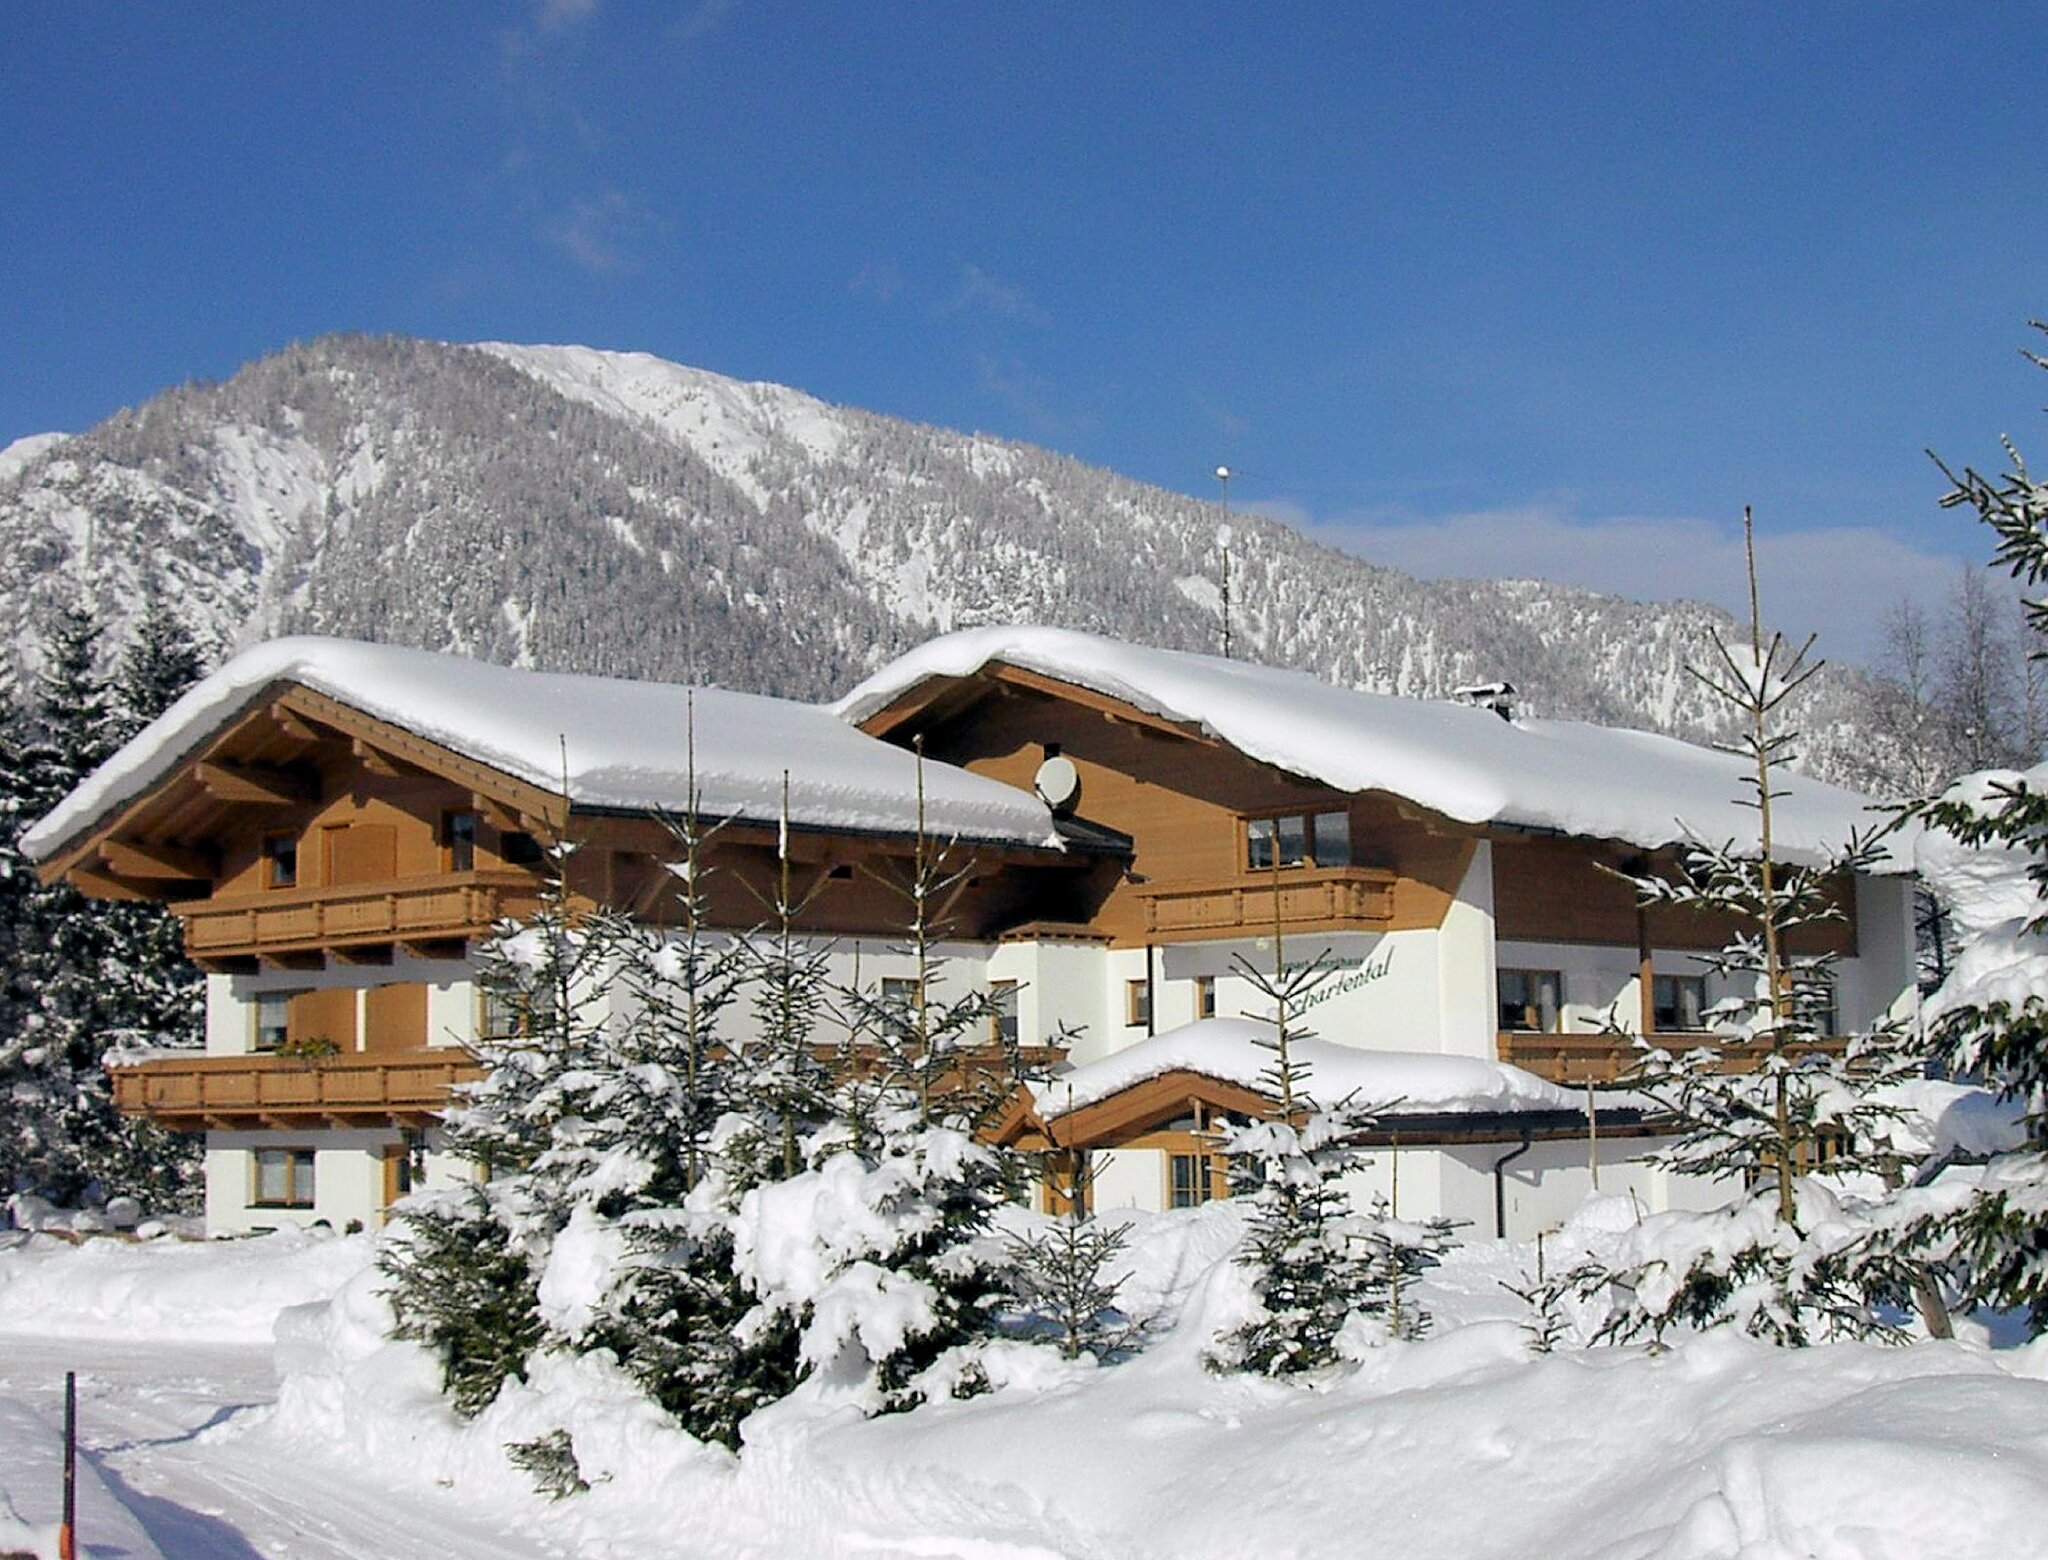 Wintermärchen Pillerseetal